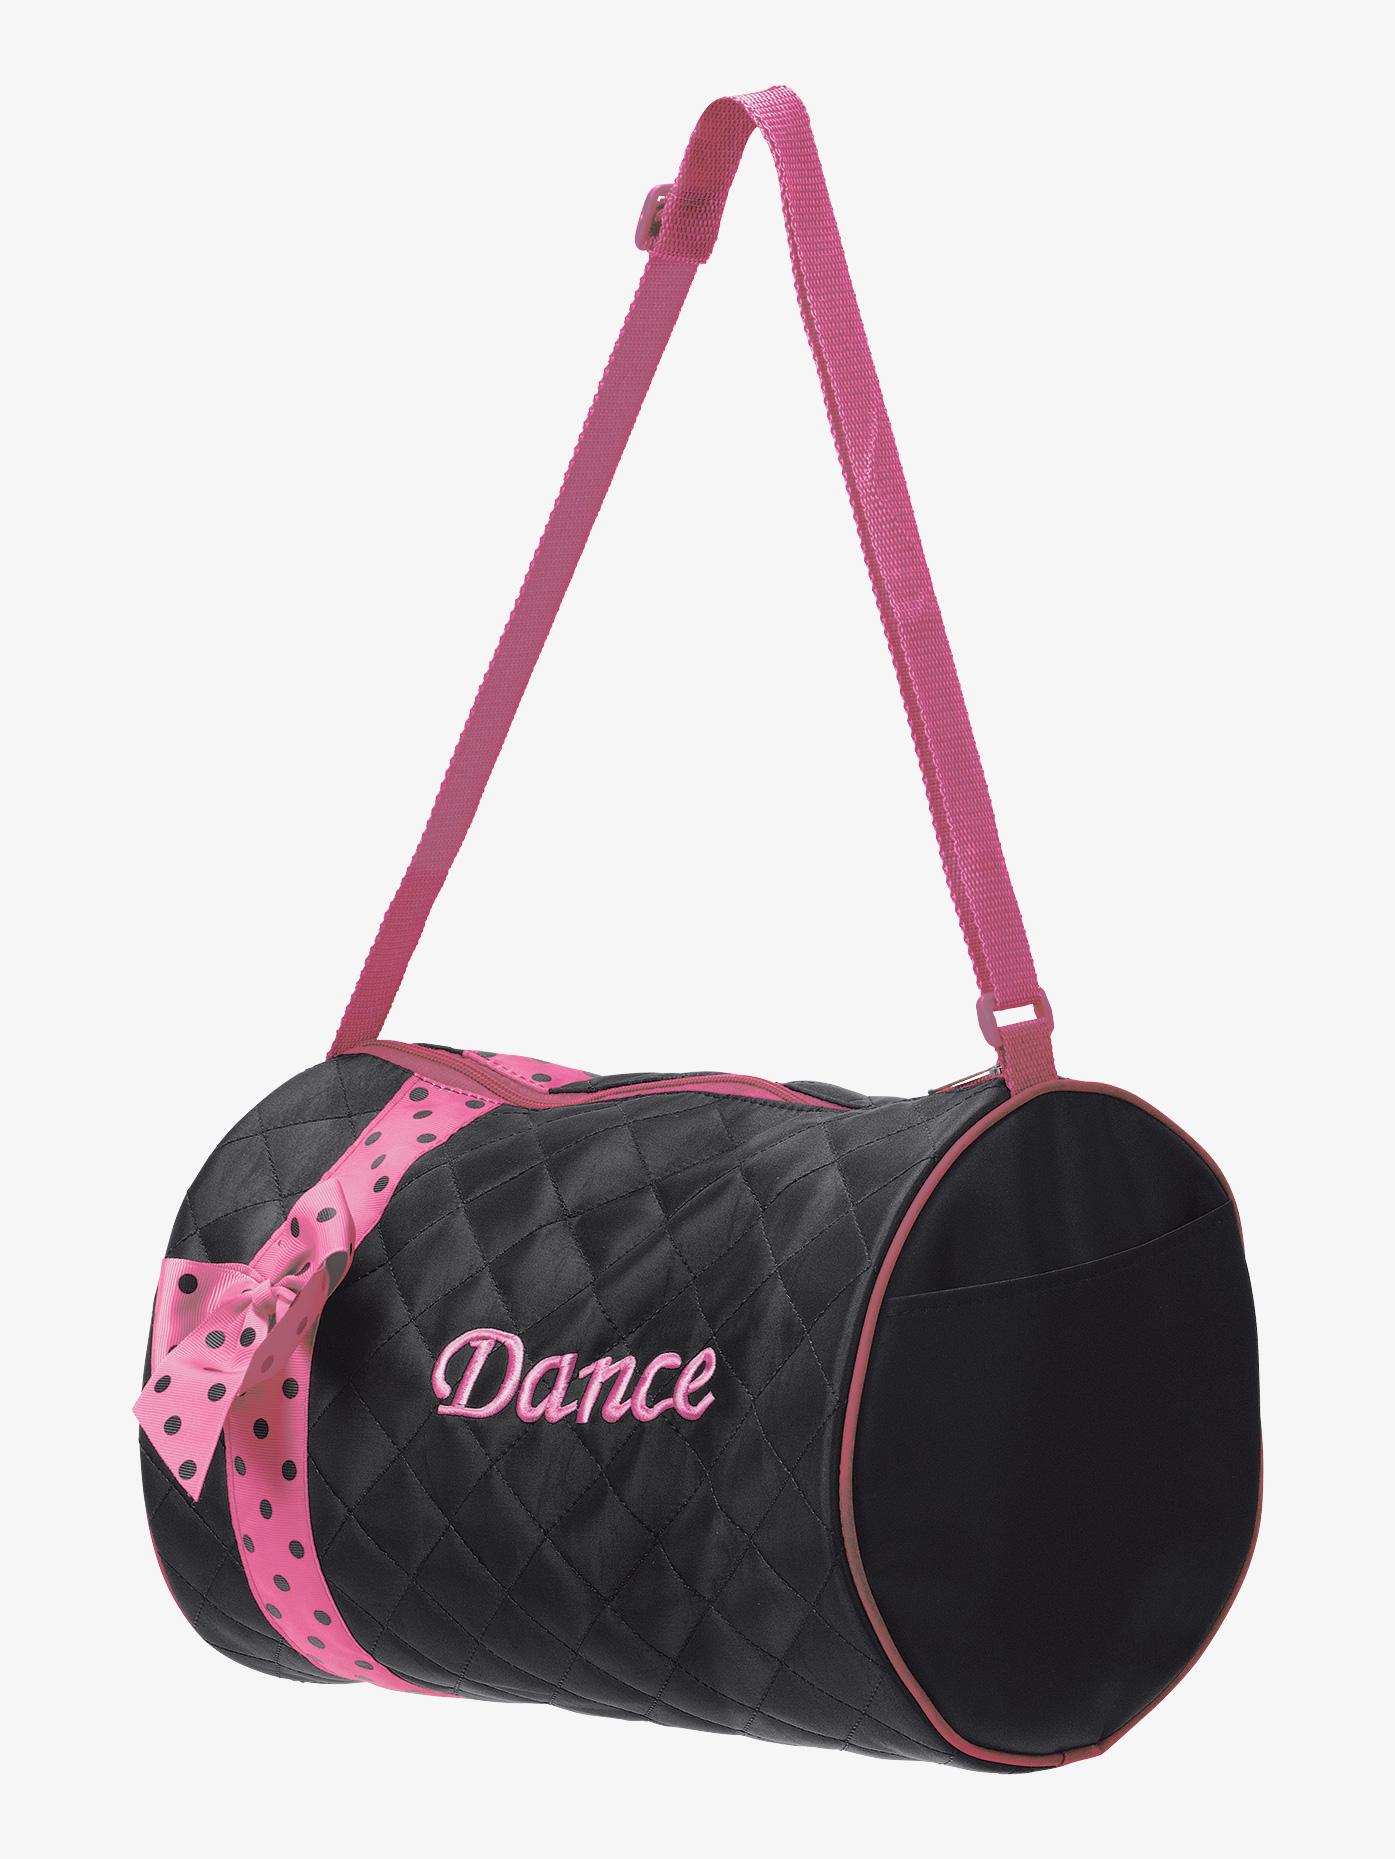 La Petite Ballerina Polka Dot Dance Duffle CBG28213